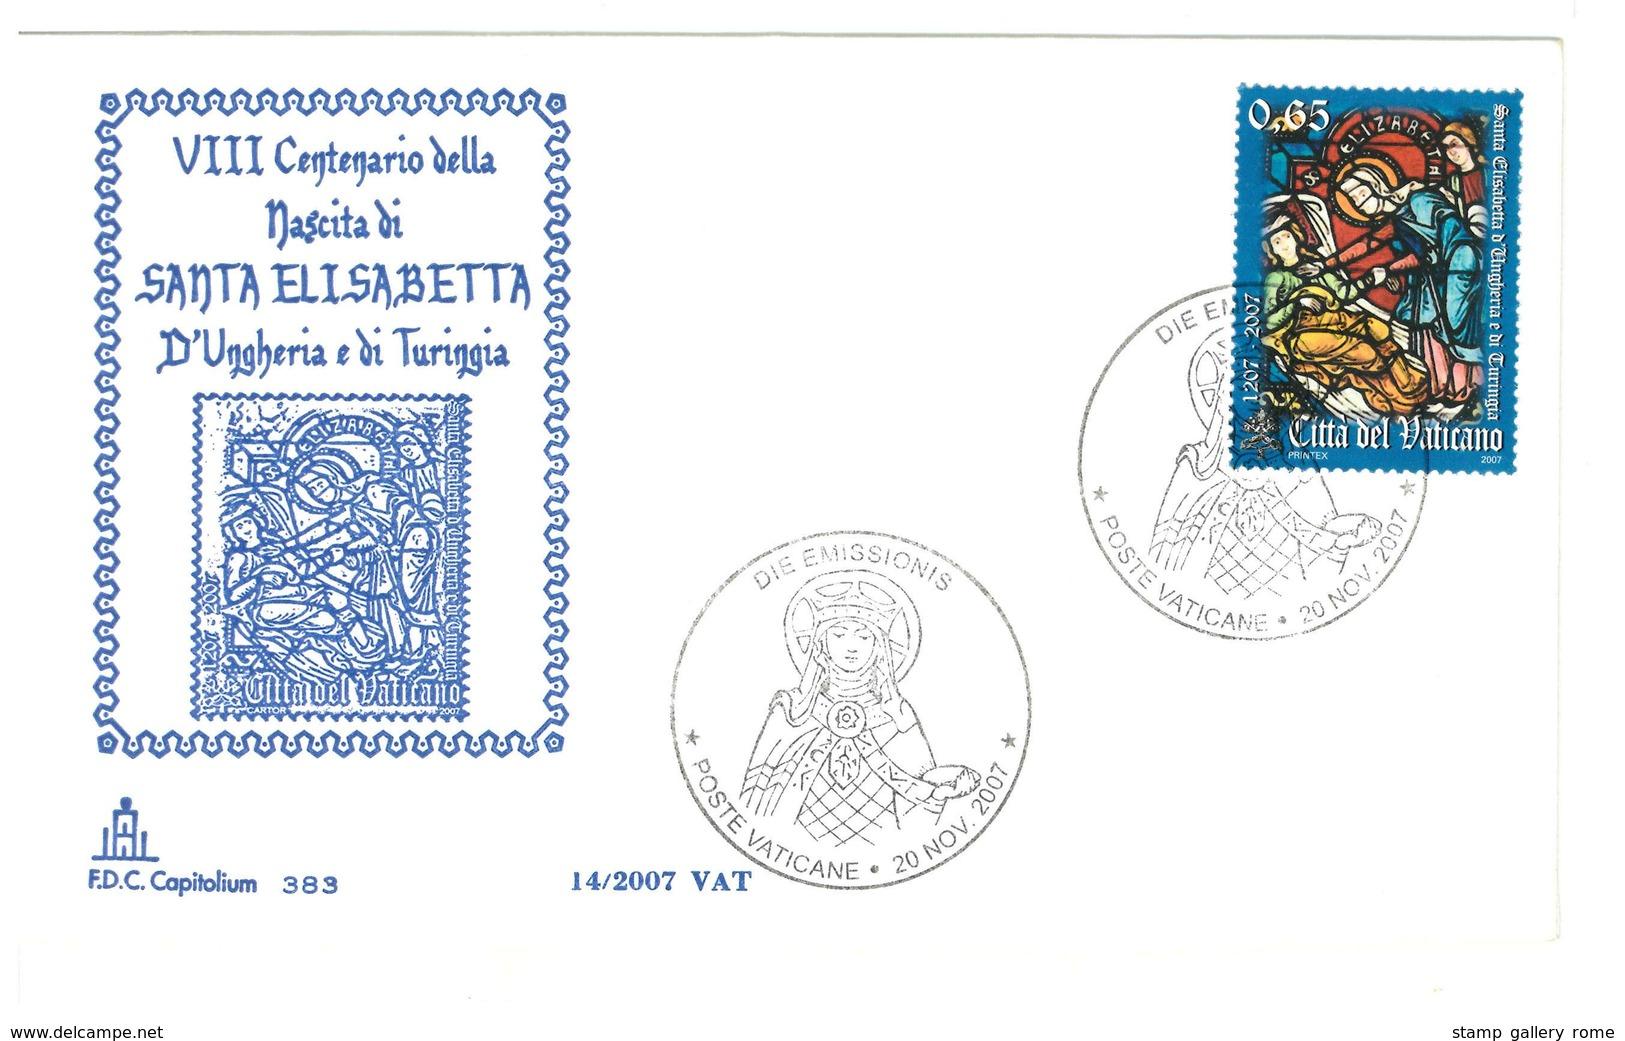 VATICANO  FDC CAPITOLIUM - ANNO 2007 -  SANTA ELISABETTA - FDC